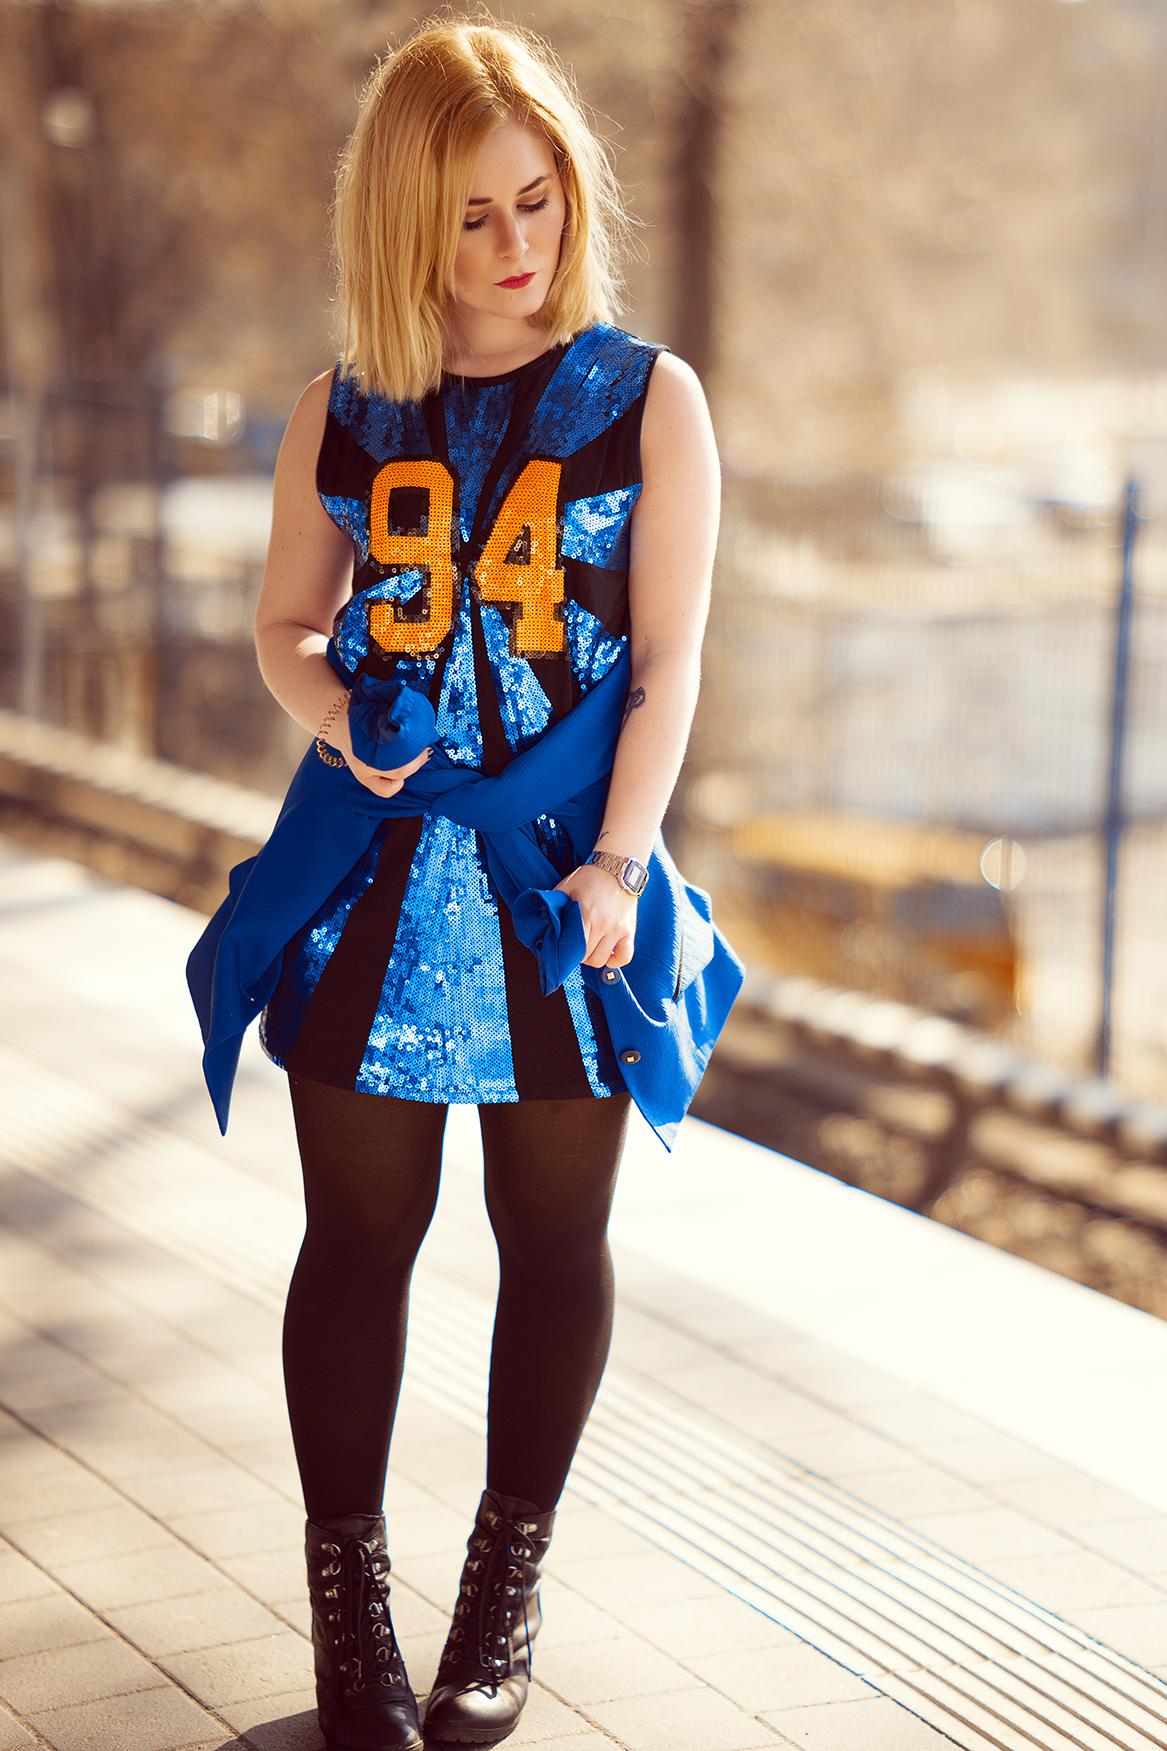 Pailletten Kleid Herbst Outfit